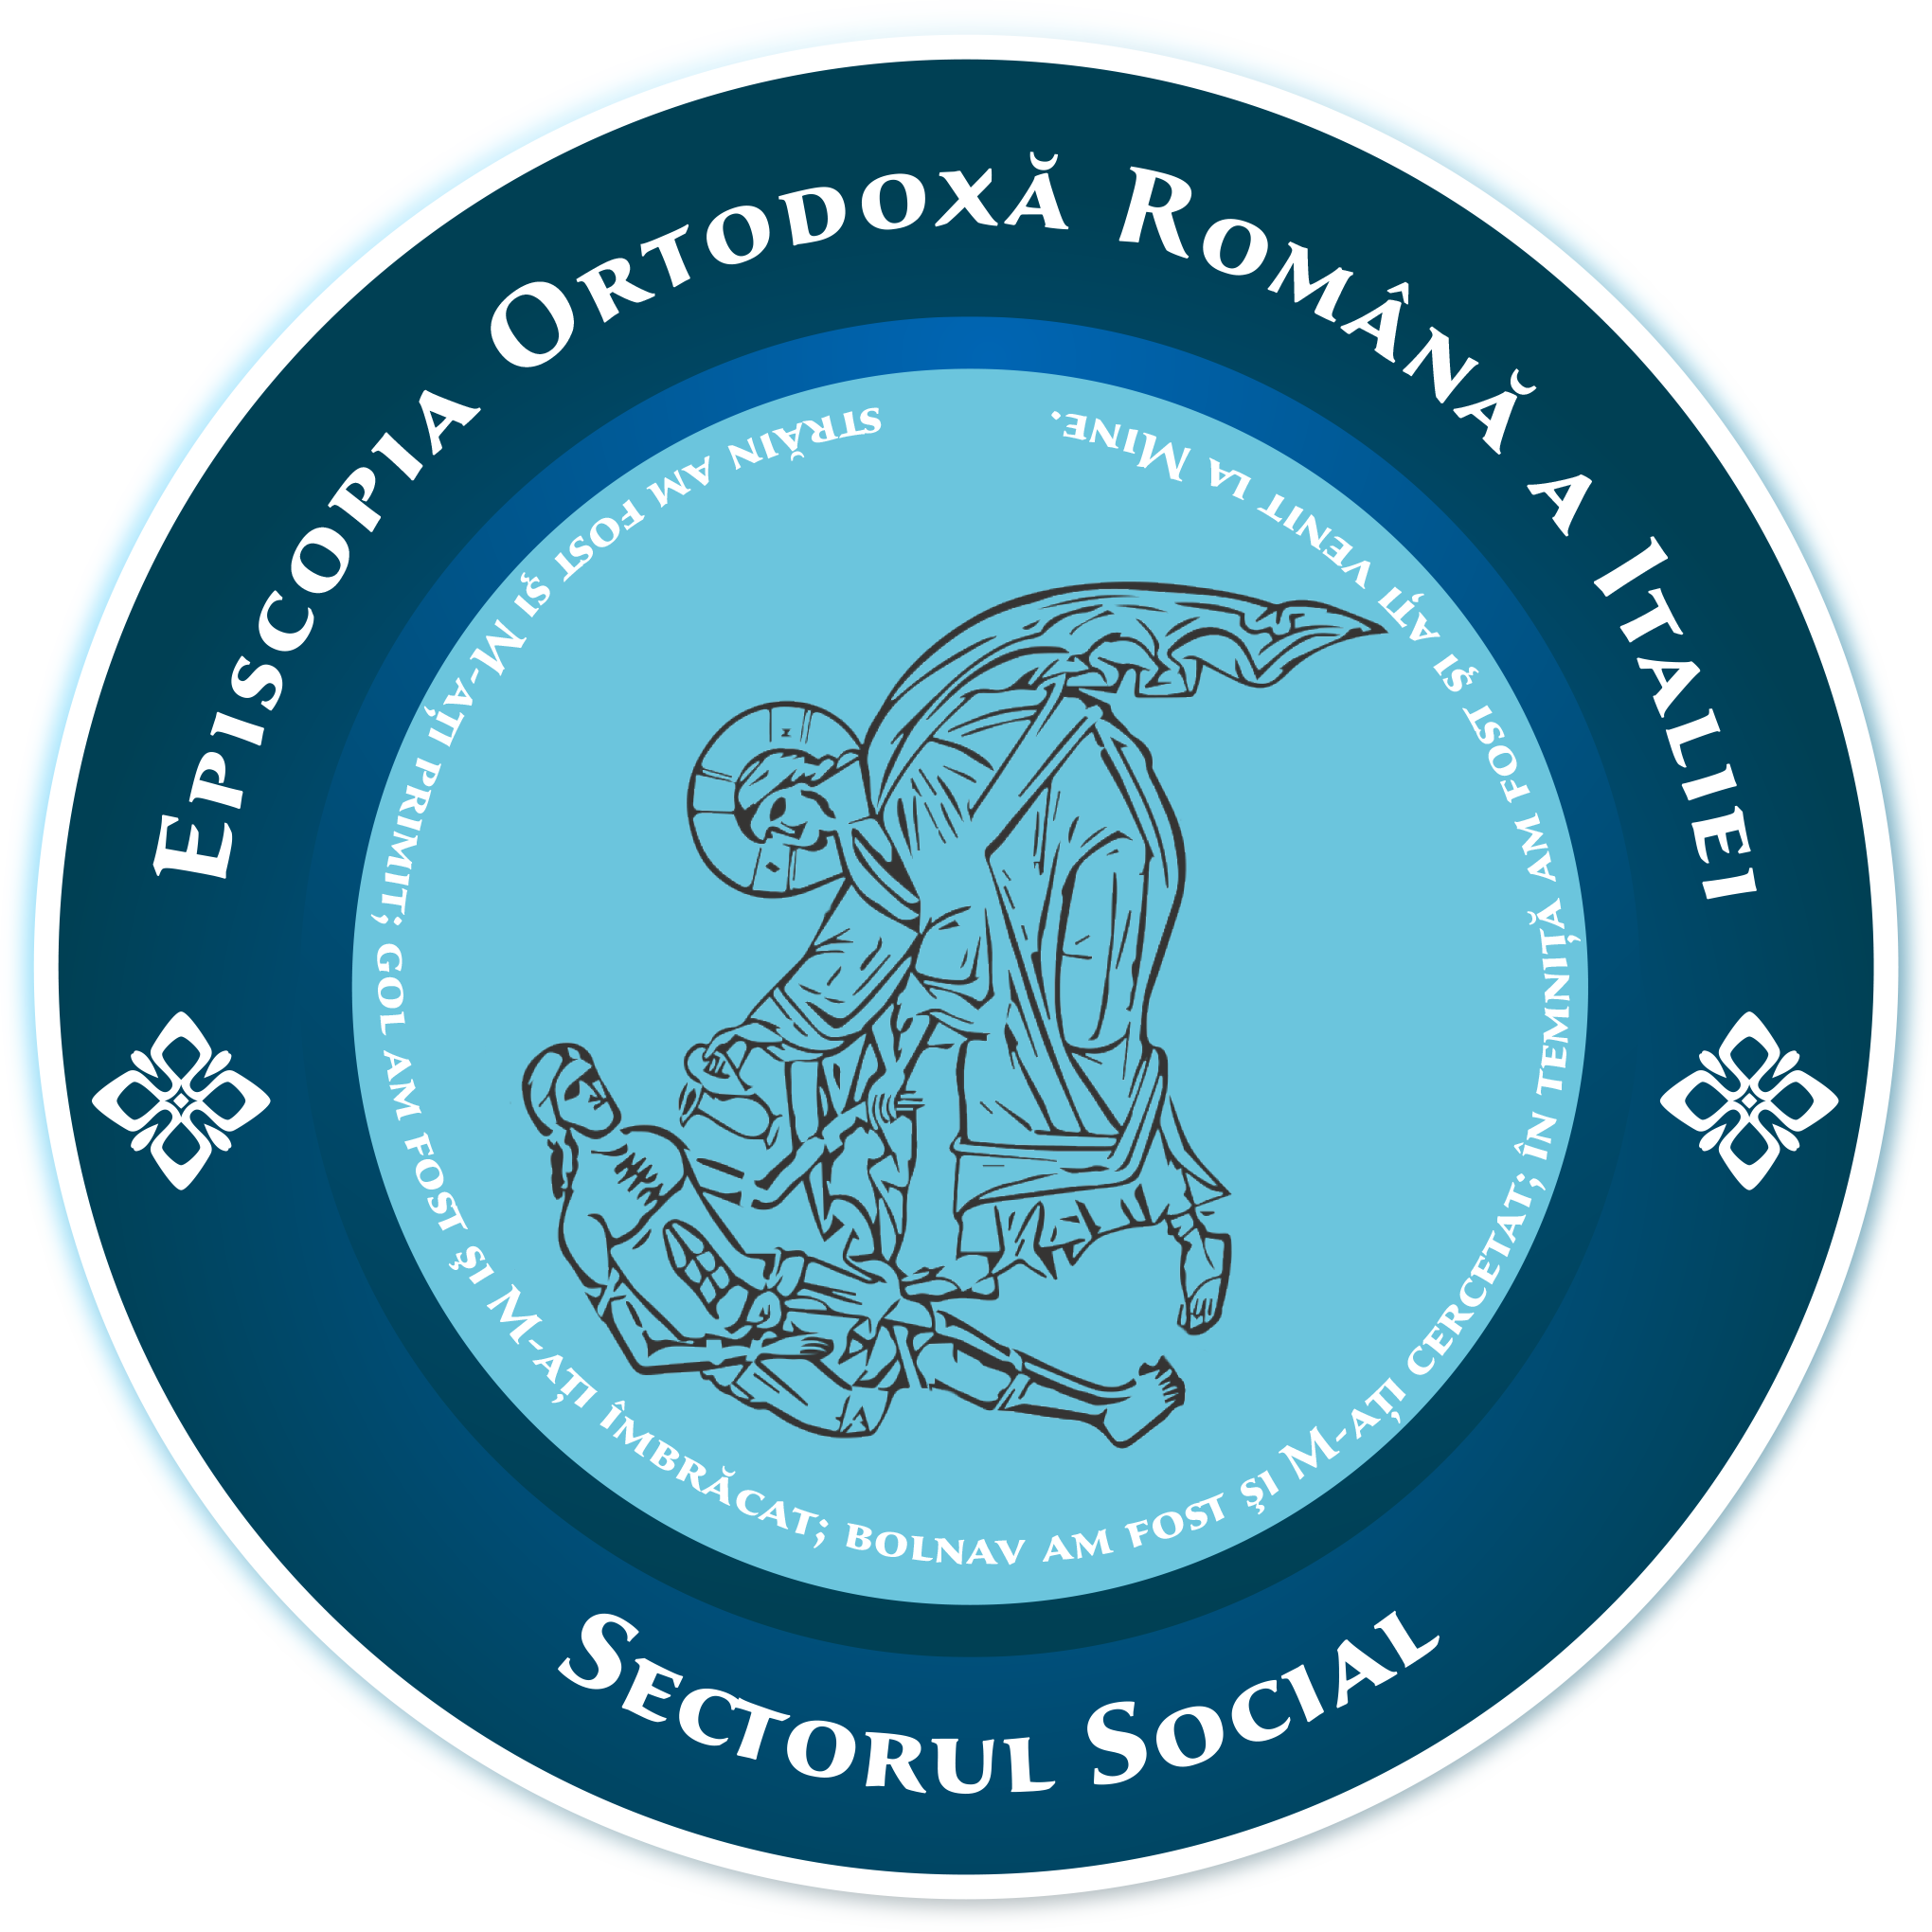 Sectorul Social al Episcopiei Ortodoxe Române a Italiei